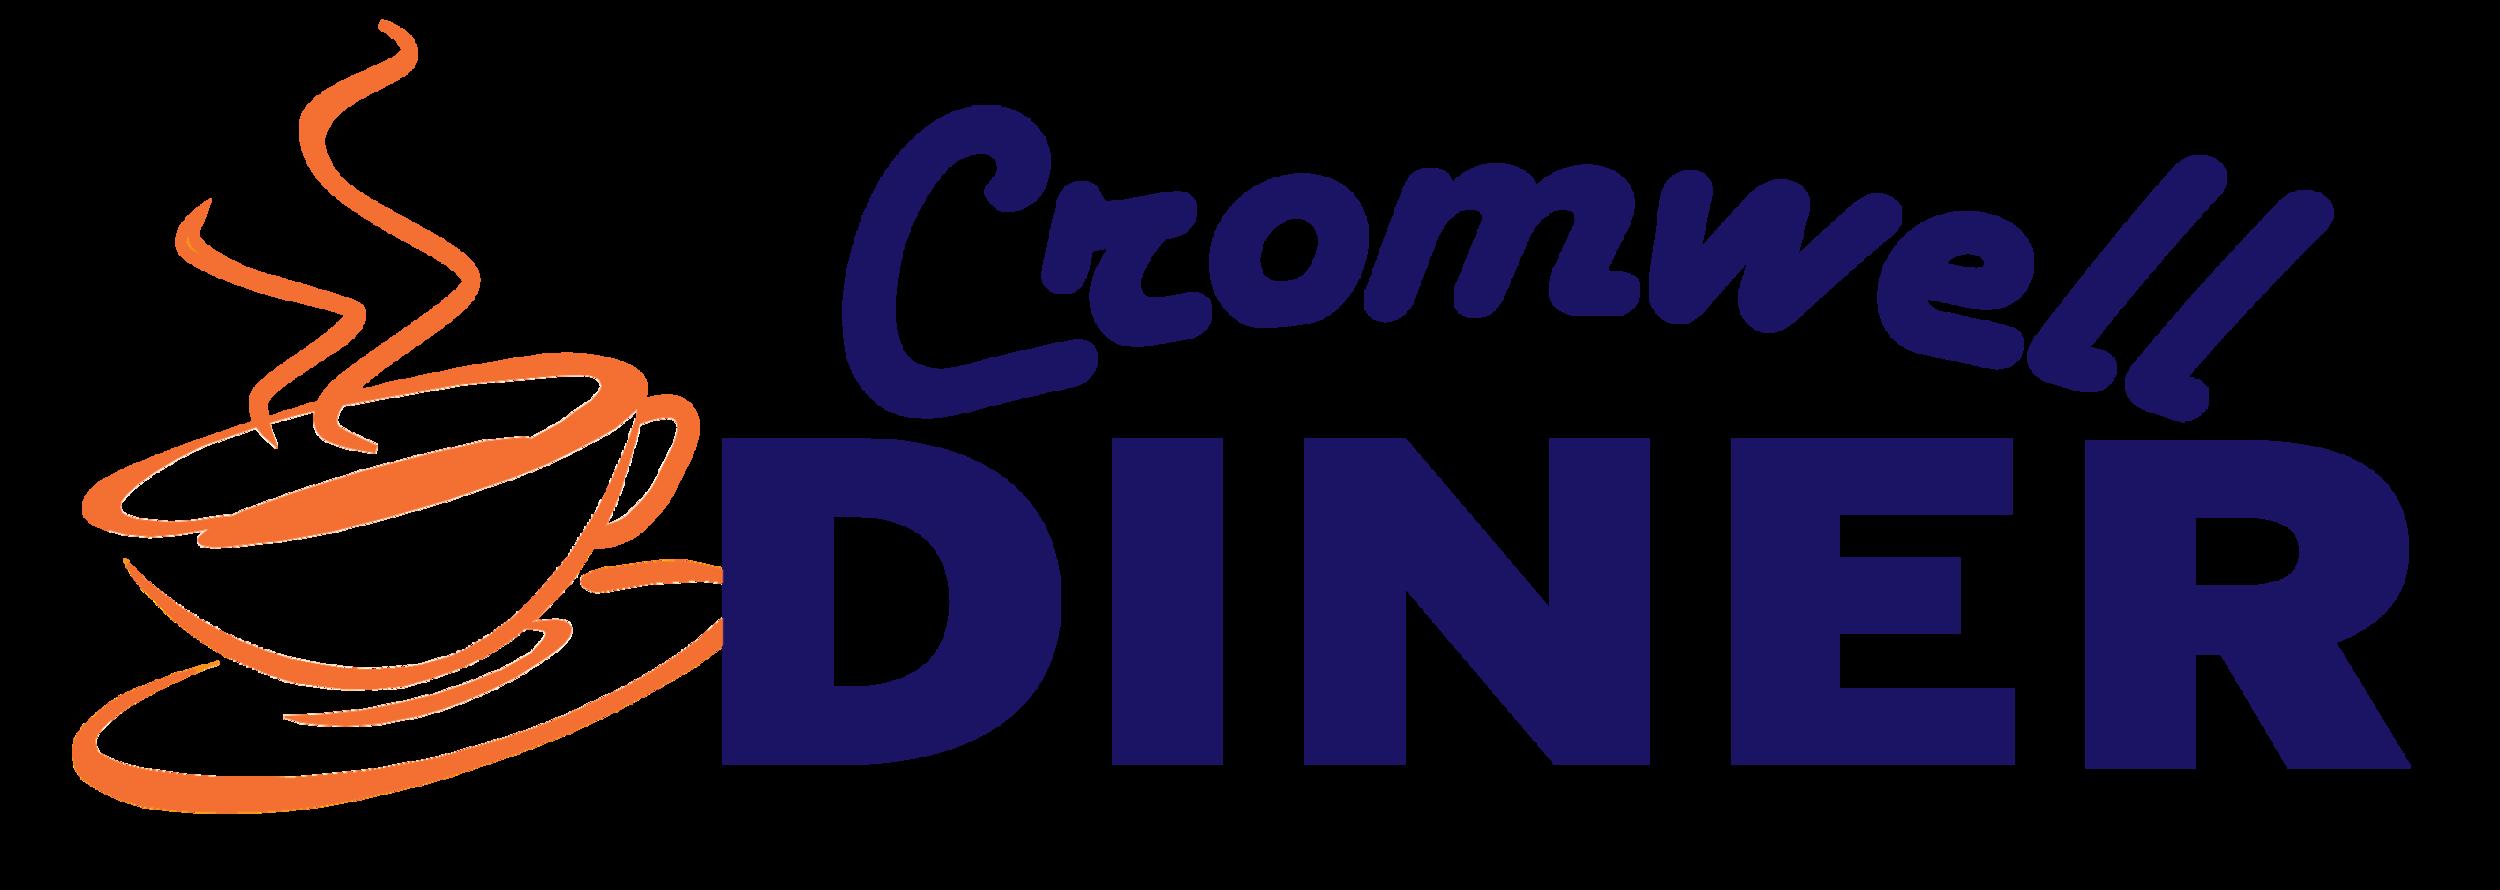 Cromwell logo_blue.png